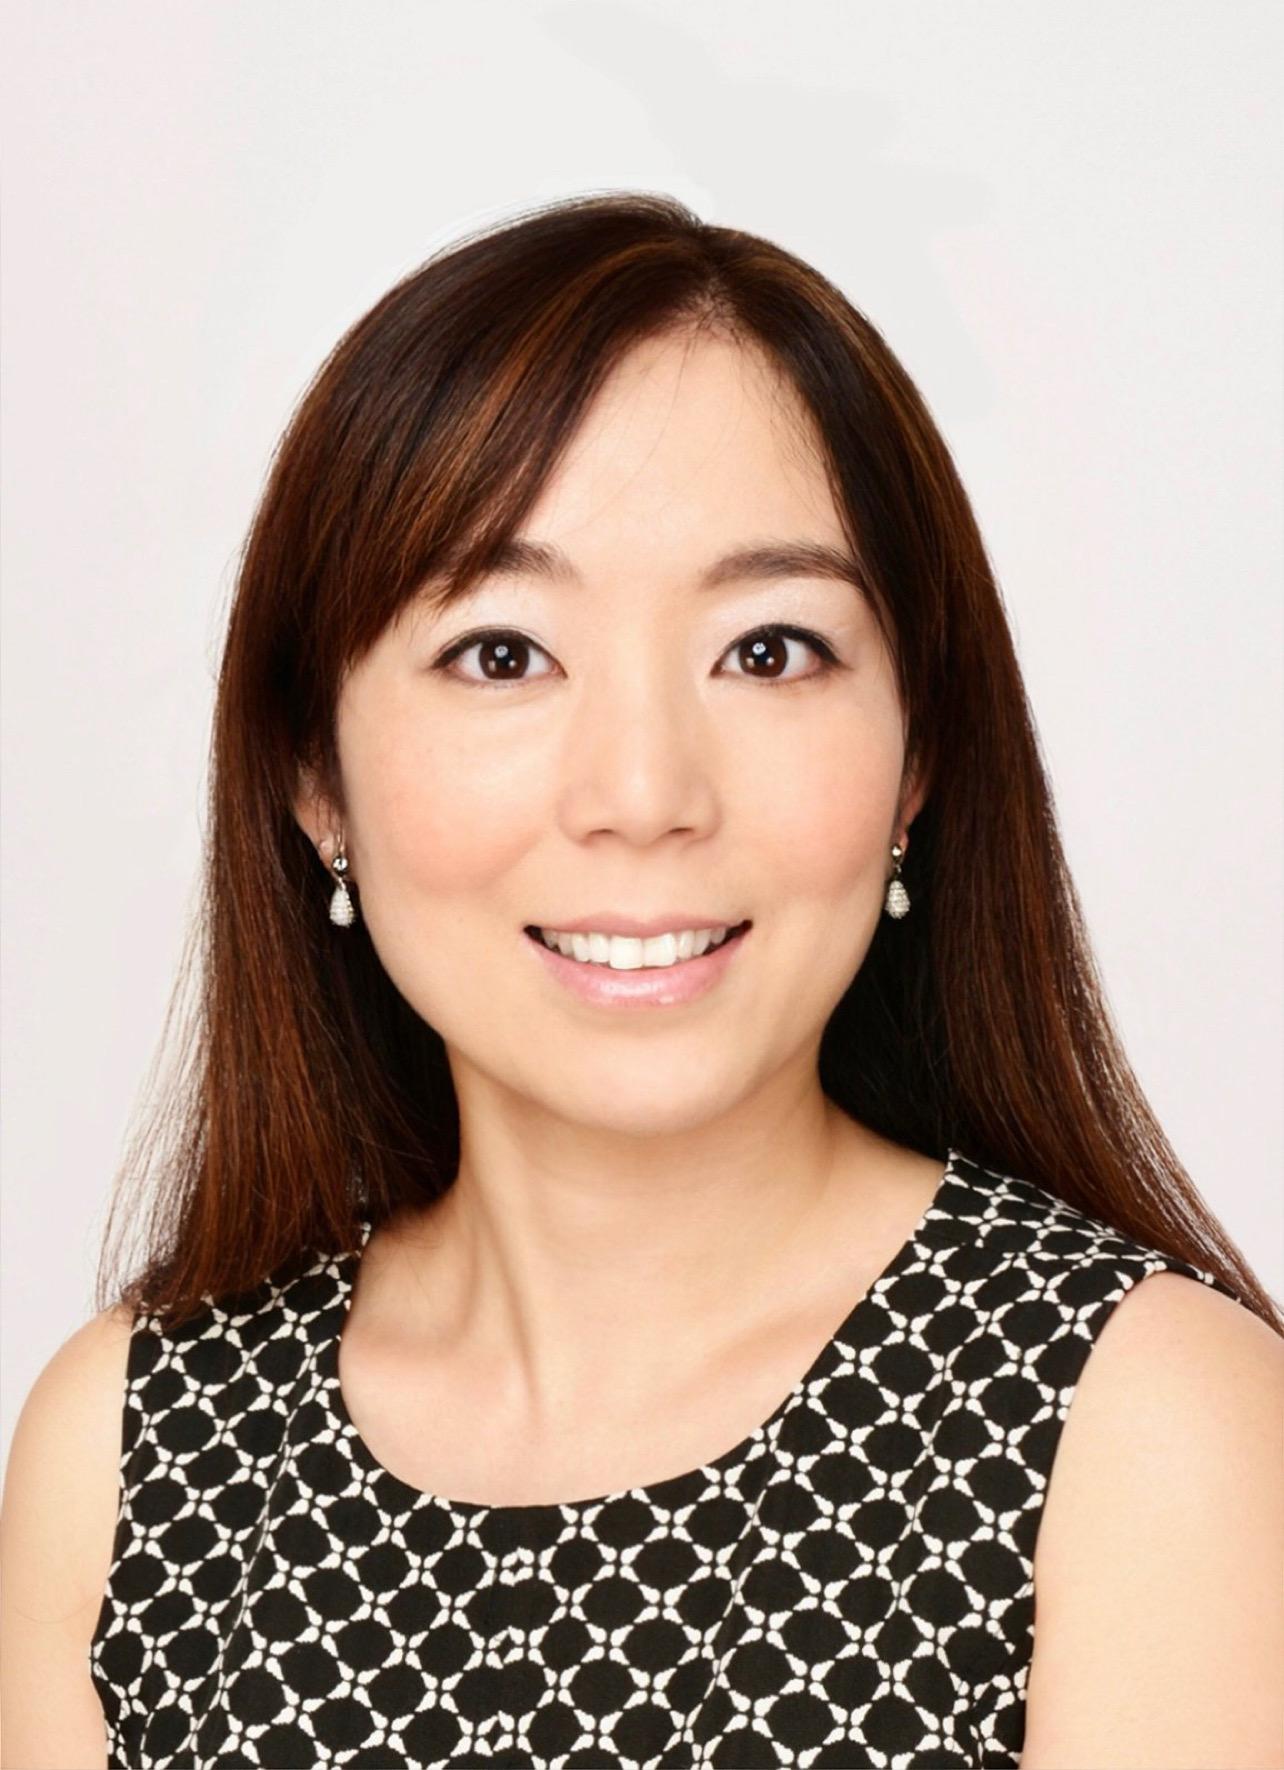 mika-hayashi-林美香足病科クリニック‐ニューヨーク‐フットケア‐ポダイアトリー